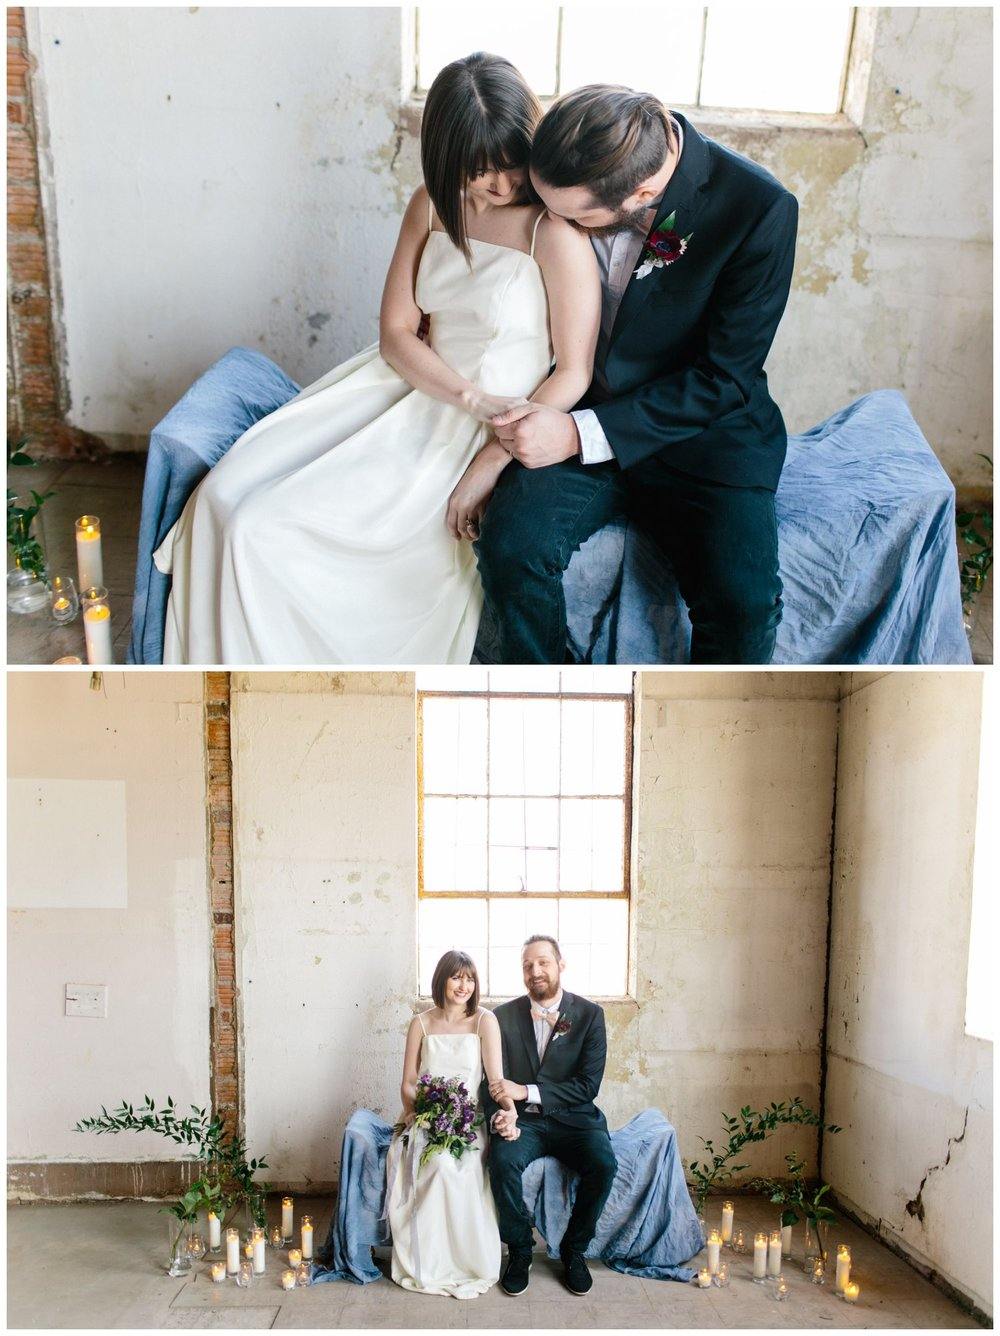 Industrial romantic elopment inspiration_43.jpg